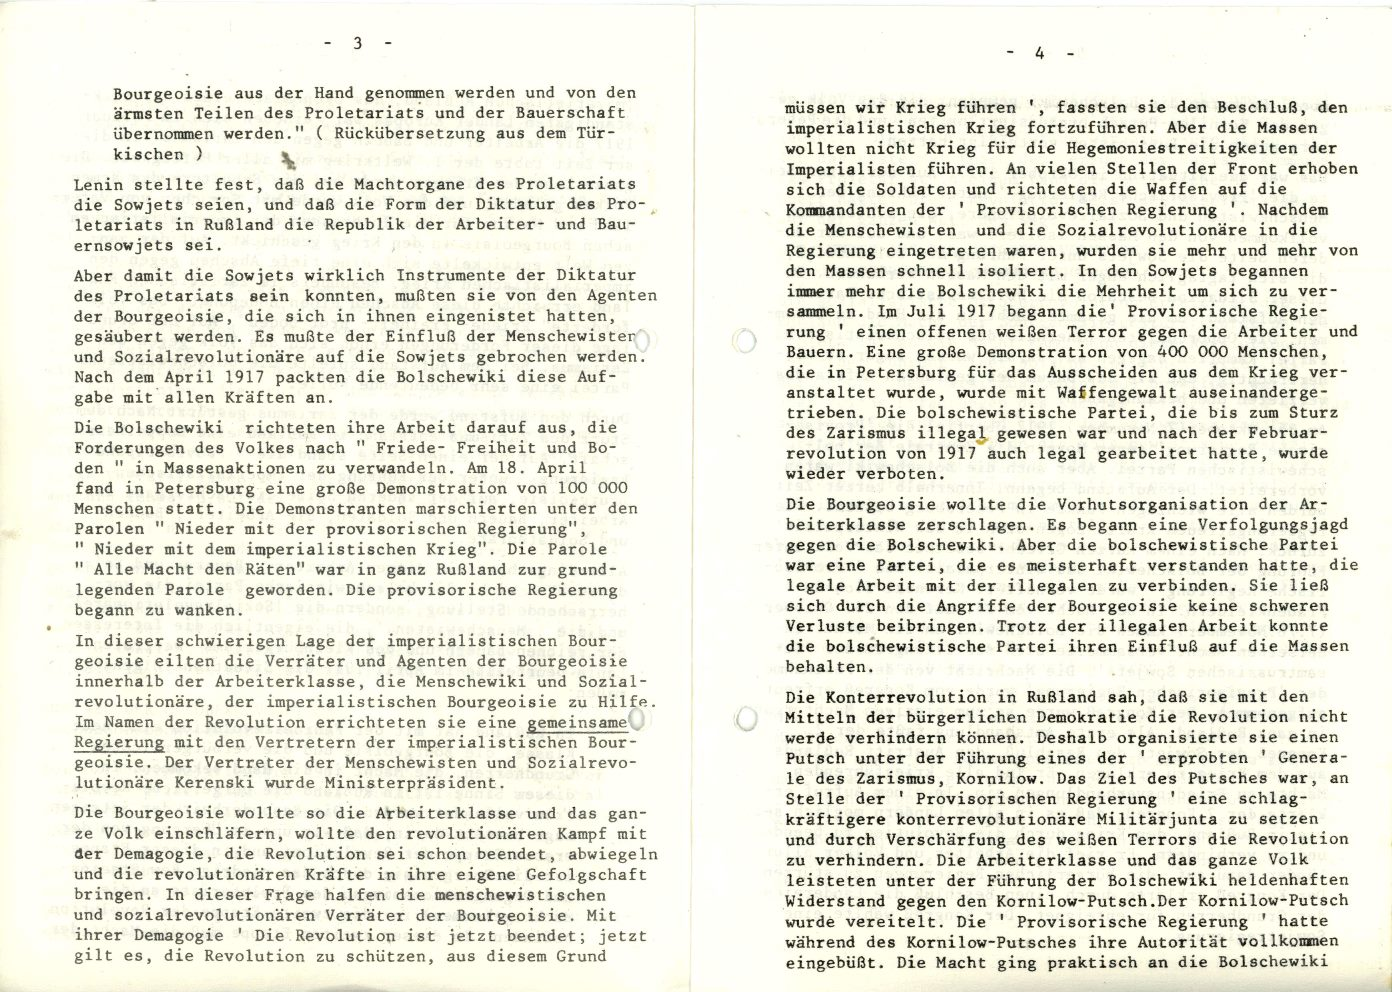 TKPML_1977_05_03